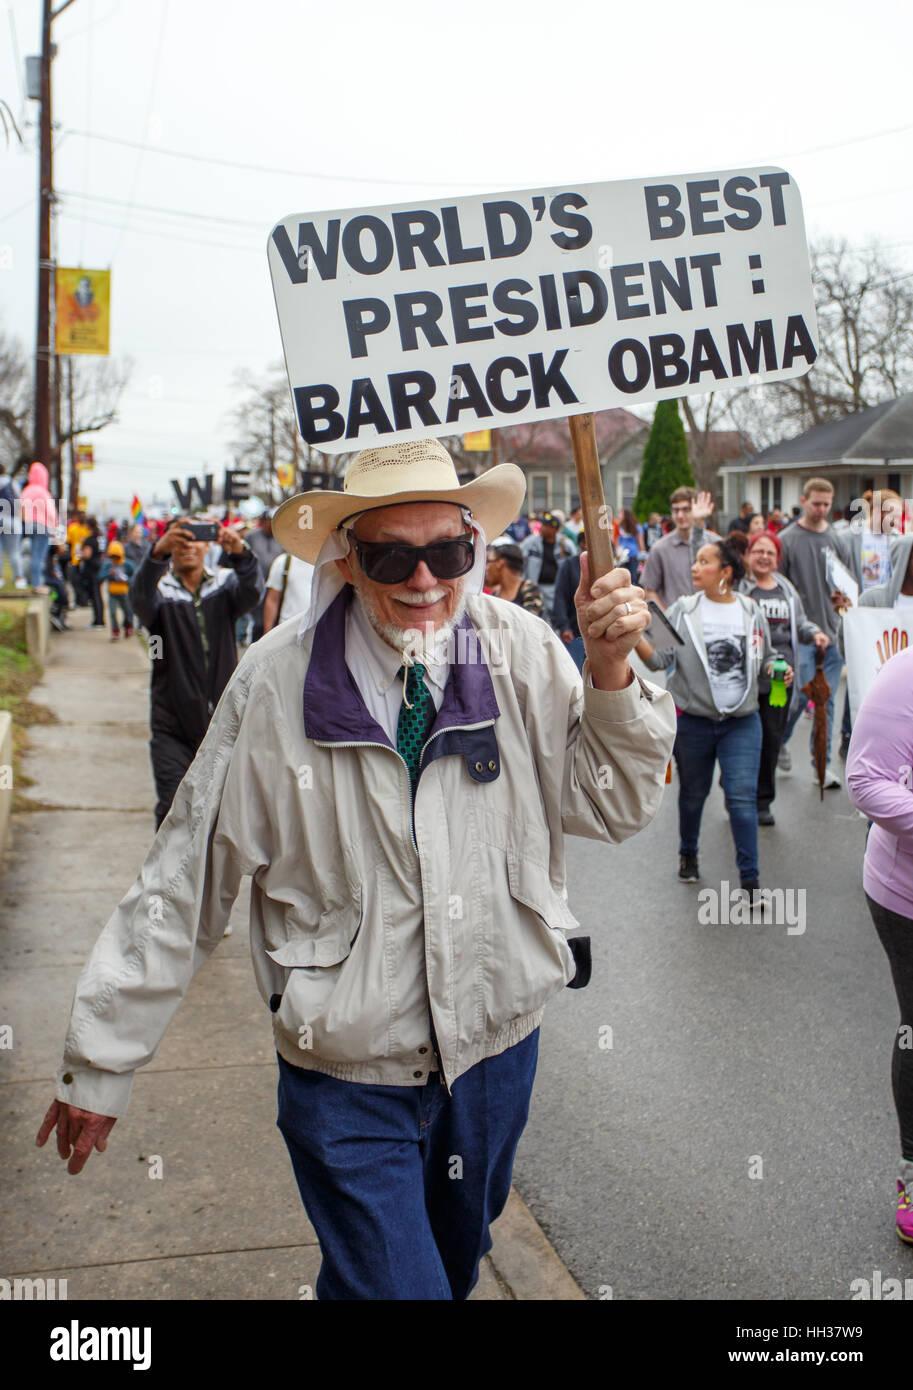 San Antonio Usa 16th January 2017 A Supporter Of U S President